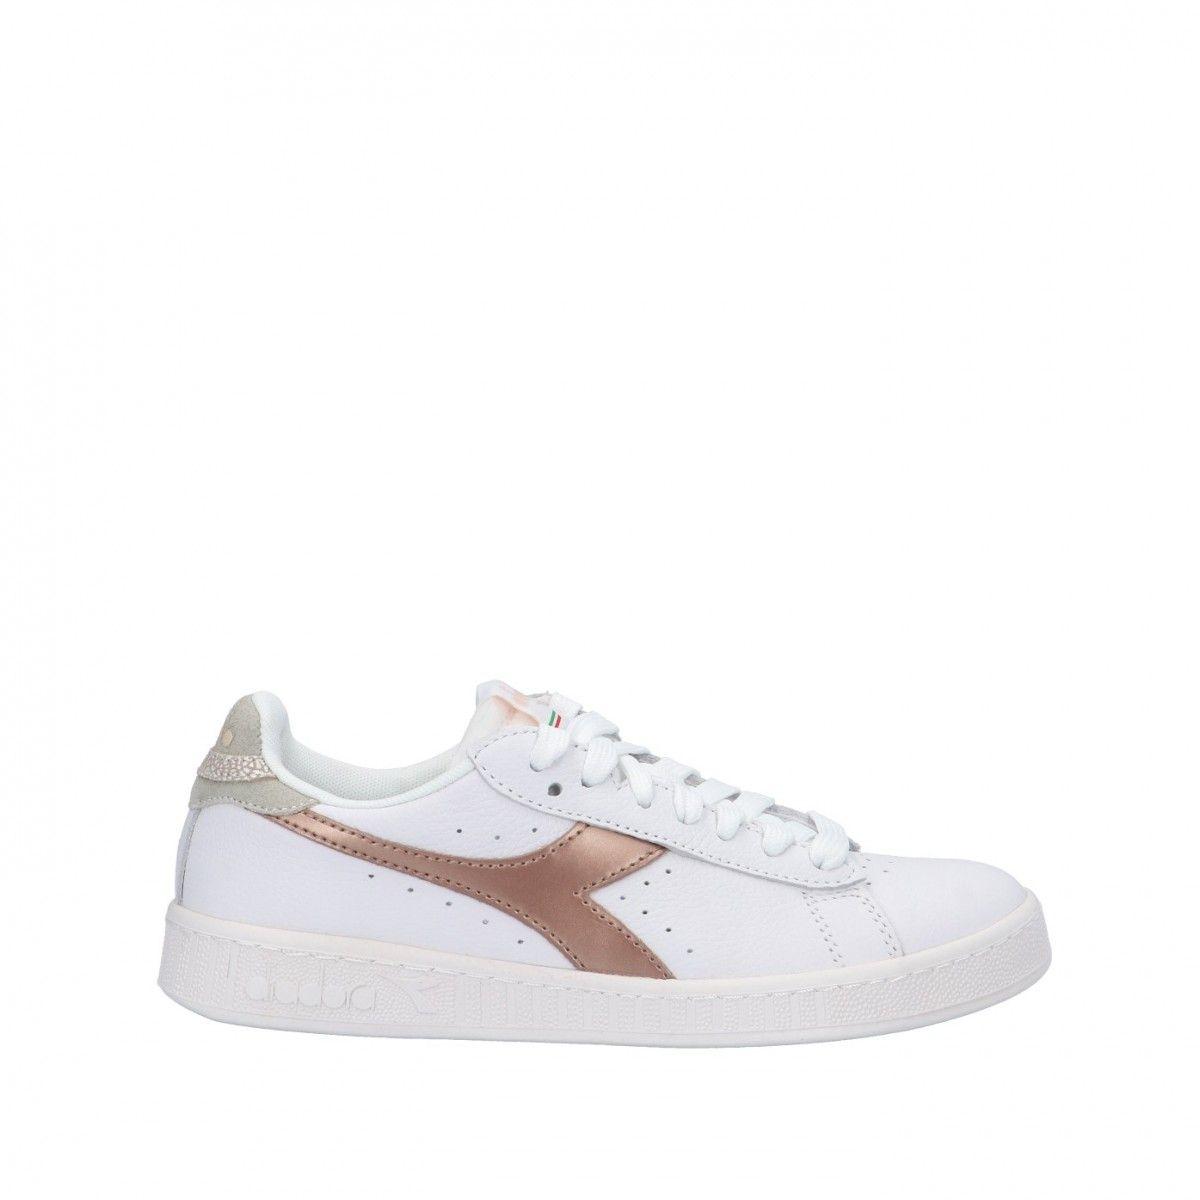 Diadora Sneaker Bianco/rame...